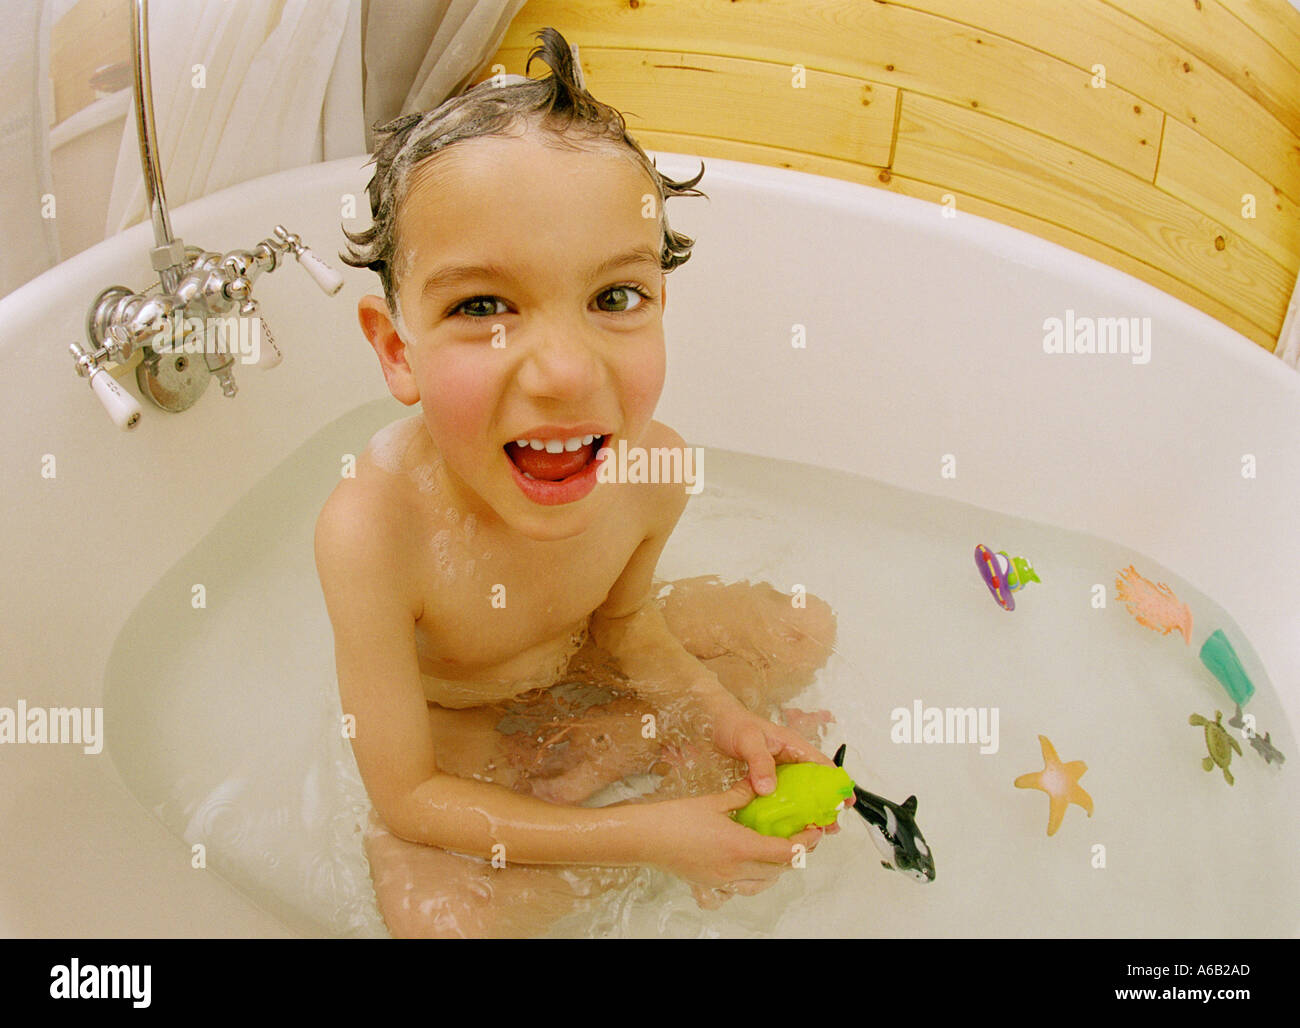 5 Year Old Boy In Bathtub Playing With Toys